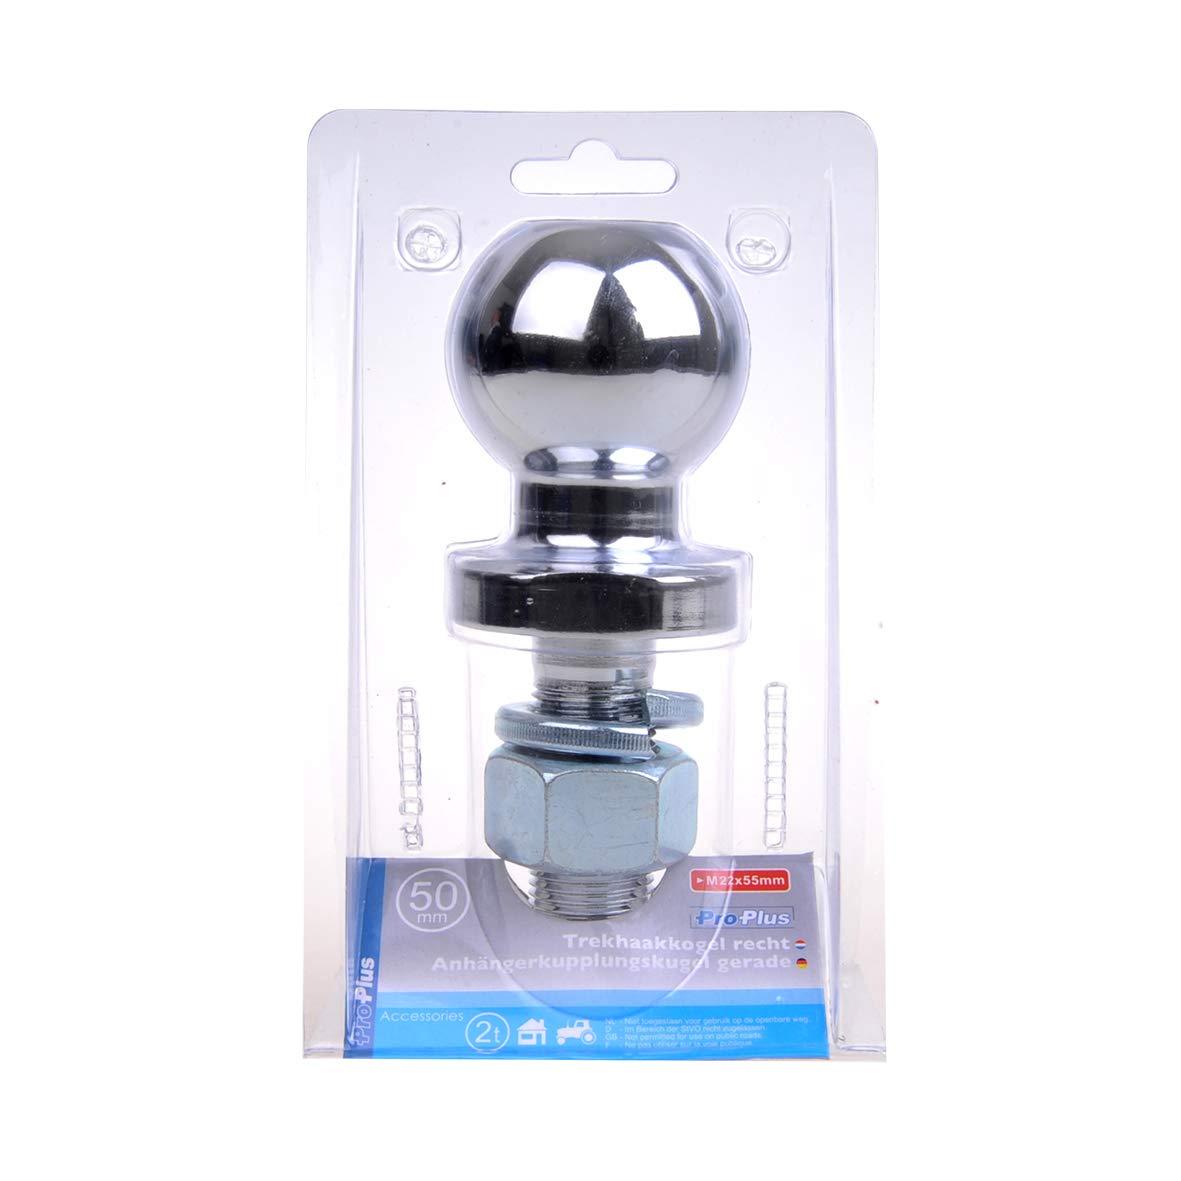 timtina Trailer Coupling Ball 50/mm 3.5t Ball Head Stud Straight Tractor Linkage Drawbar